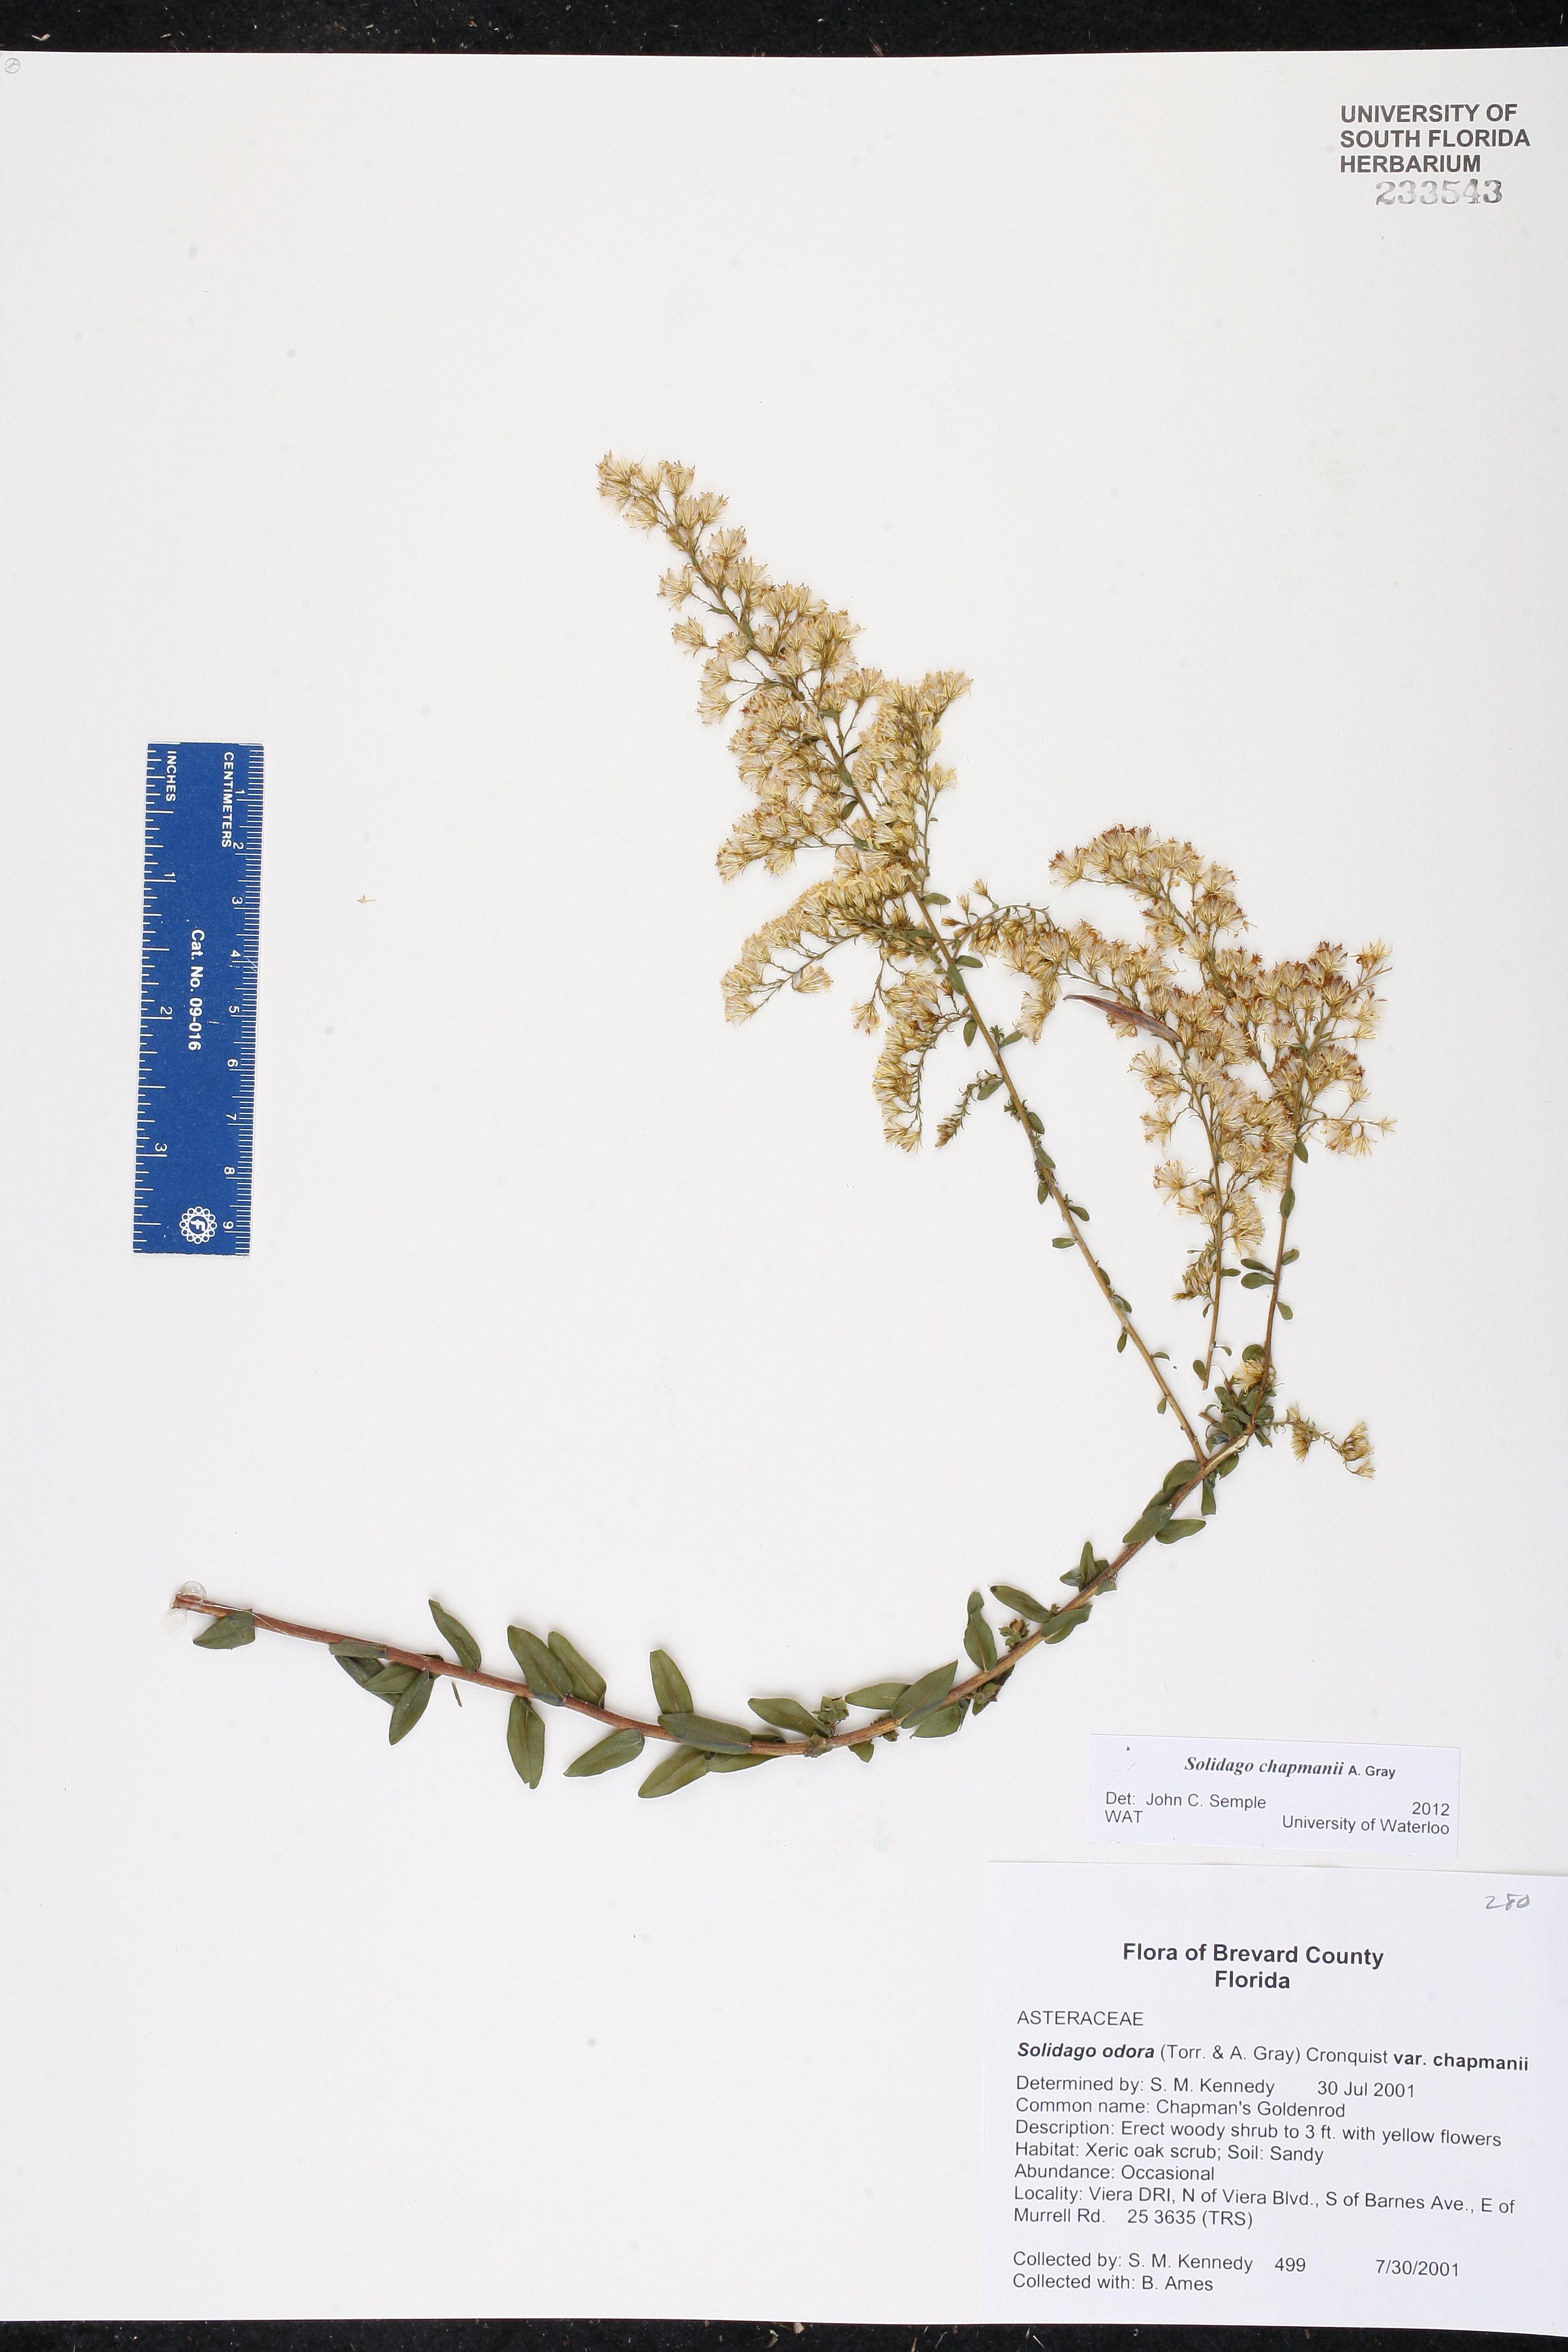 Solidago odora var  chapmanii - Species Page - ISB: Atlas of